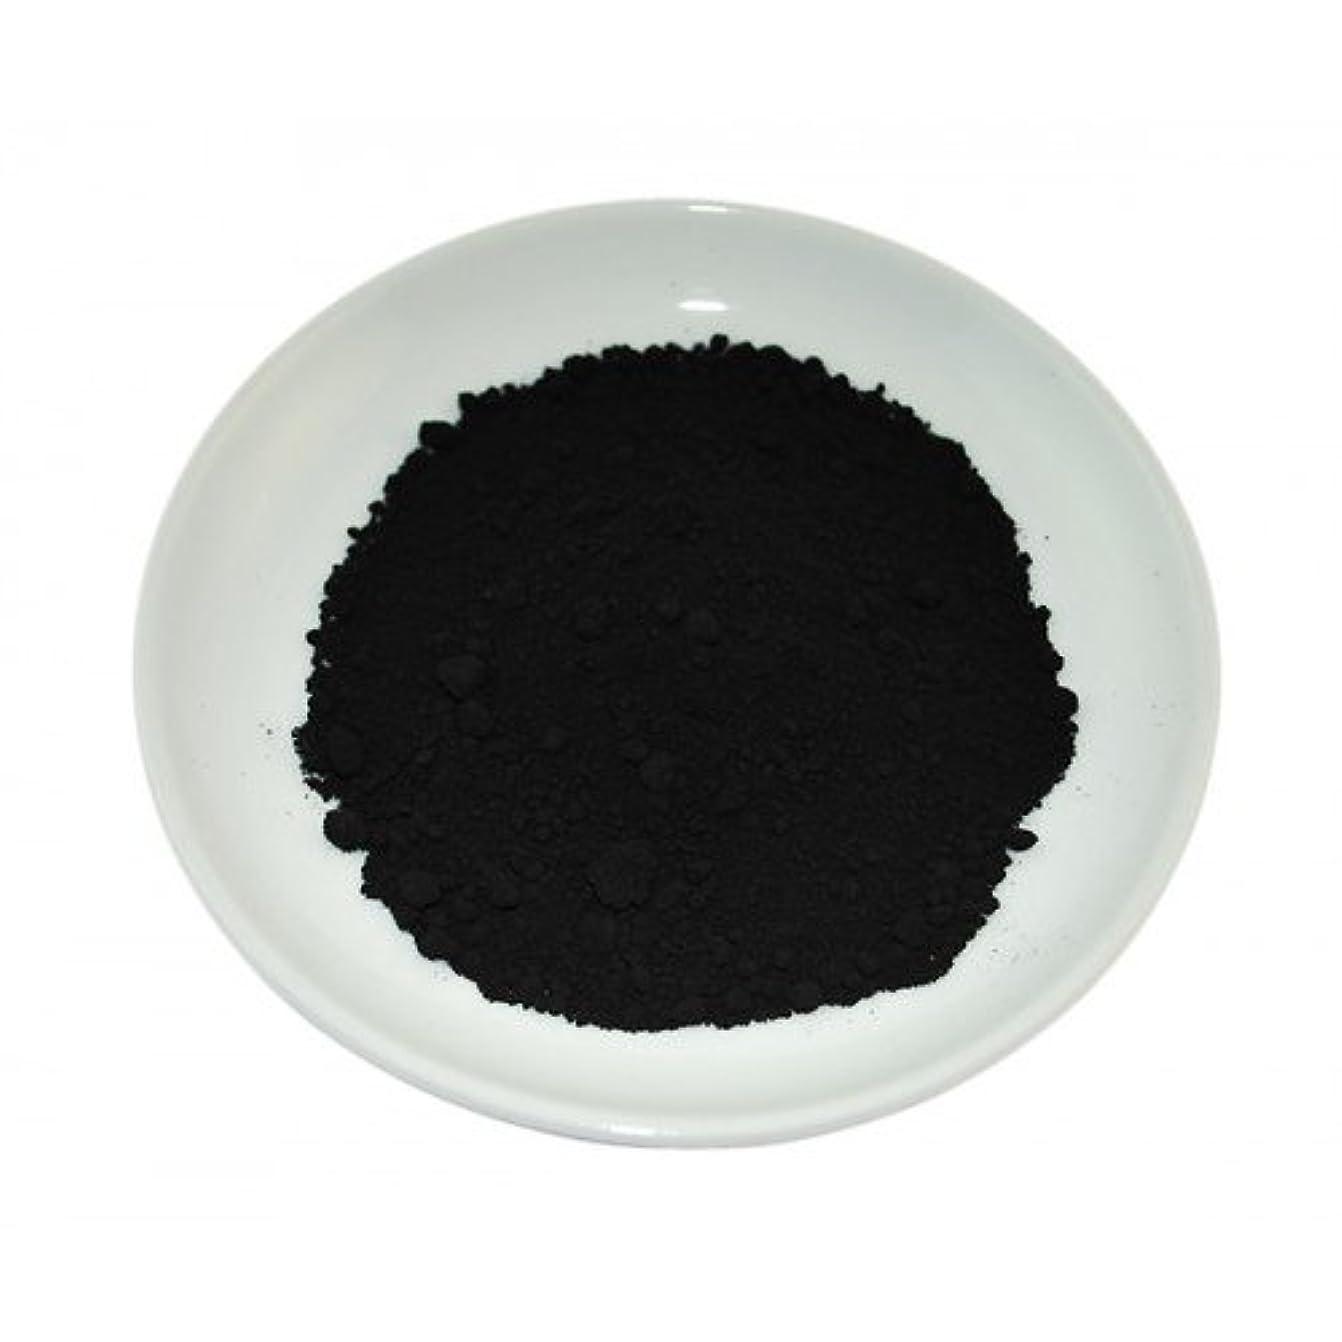 法医学療法全国Black Oxide Mineral Powder 25g